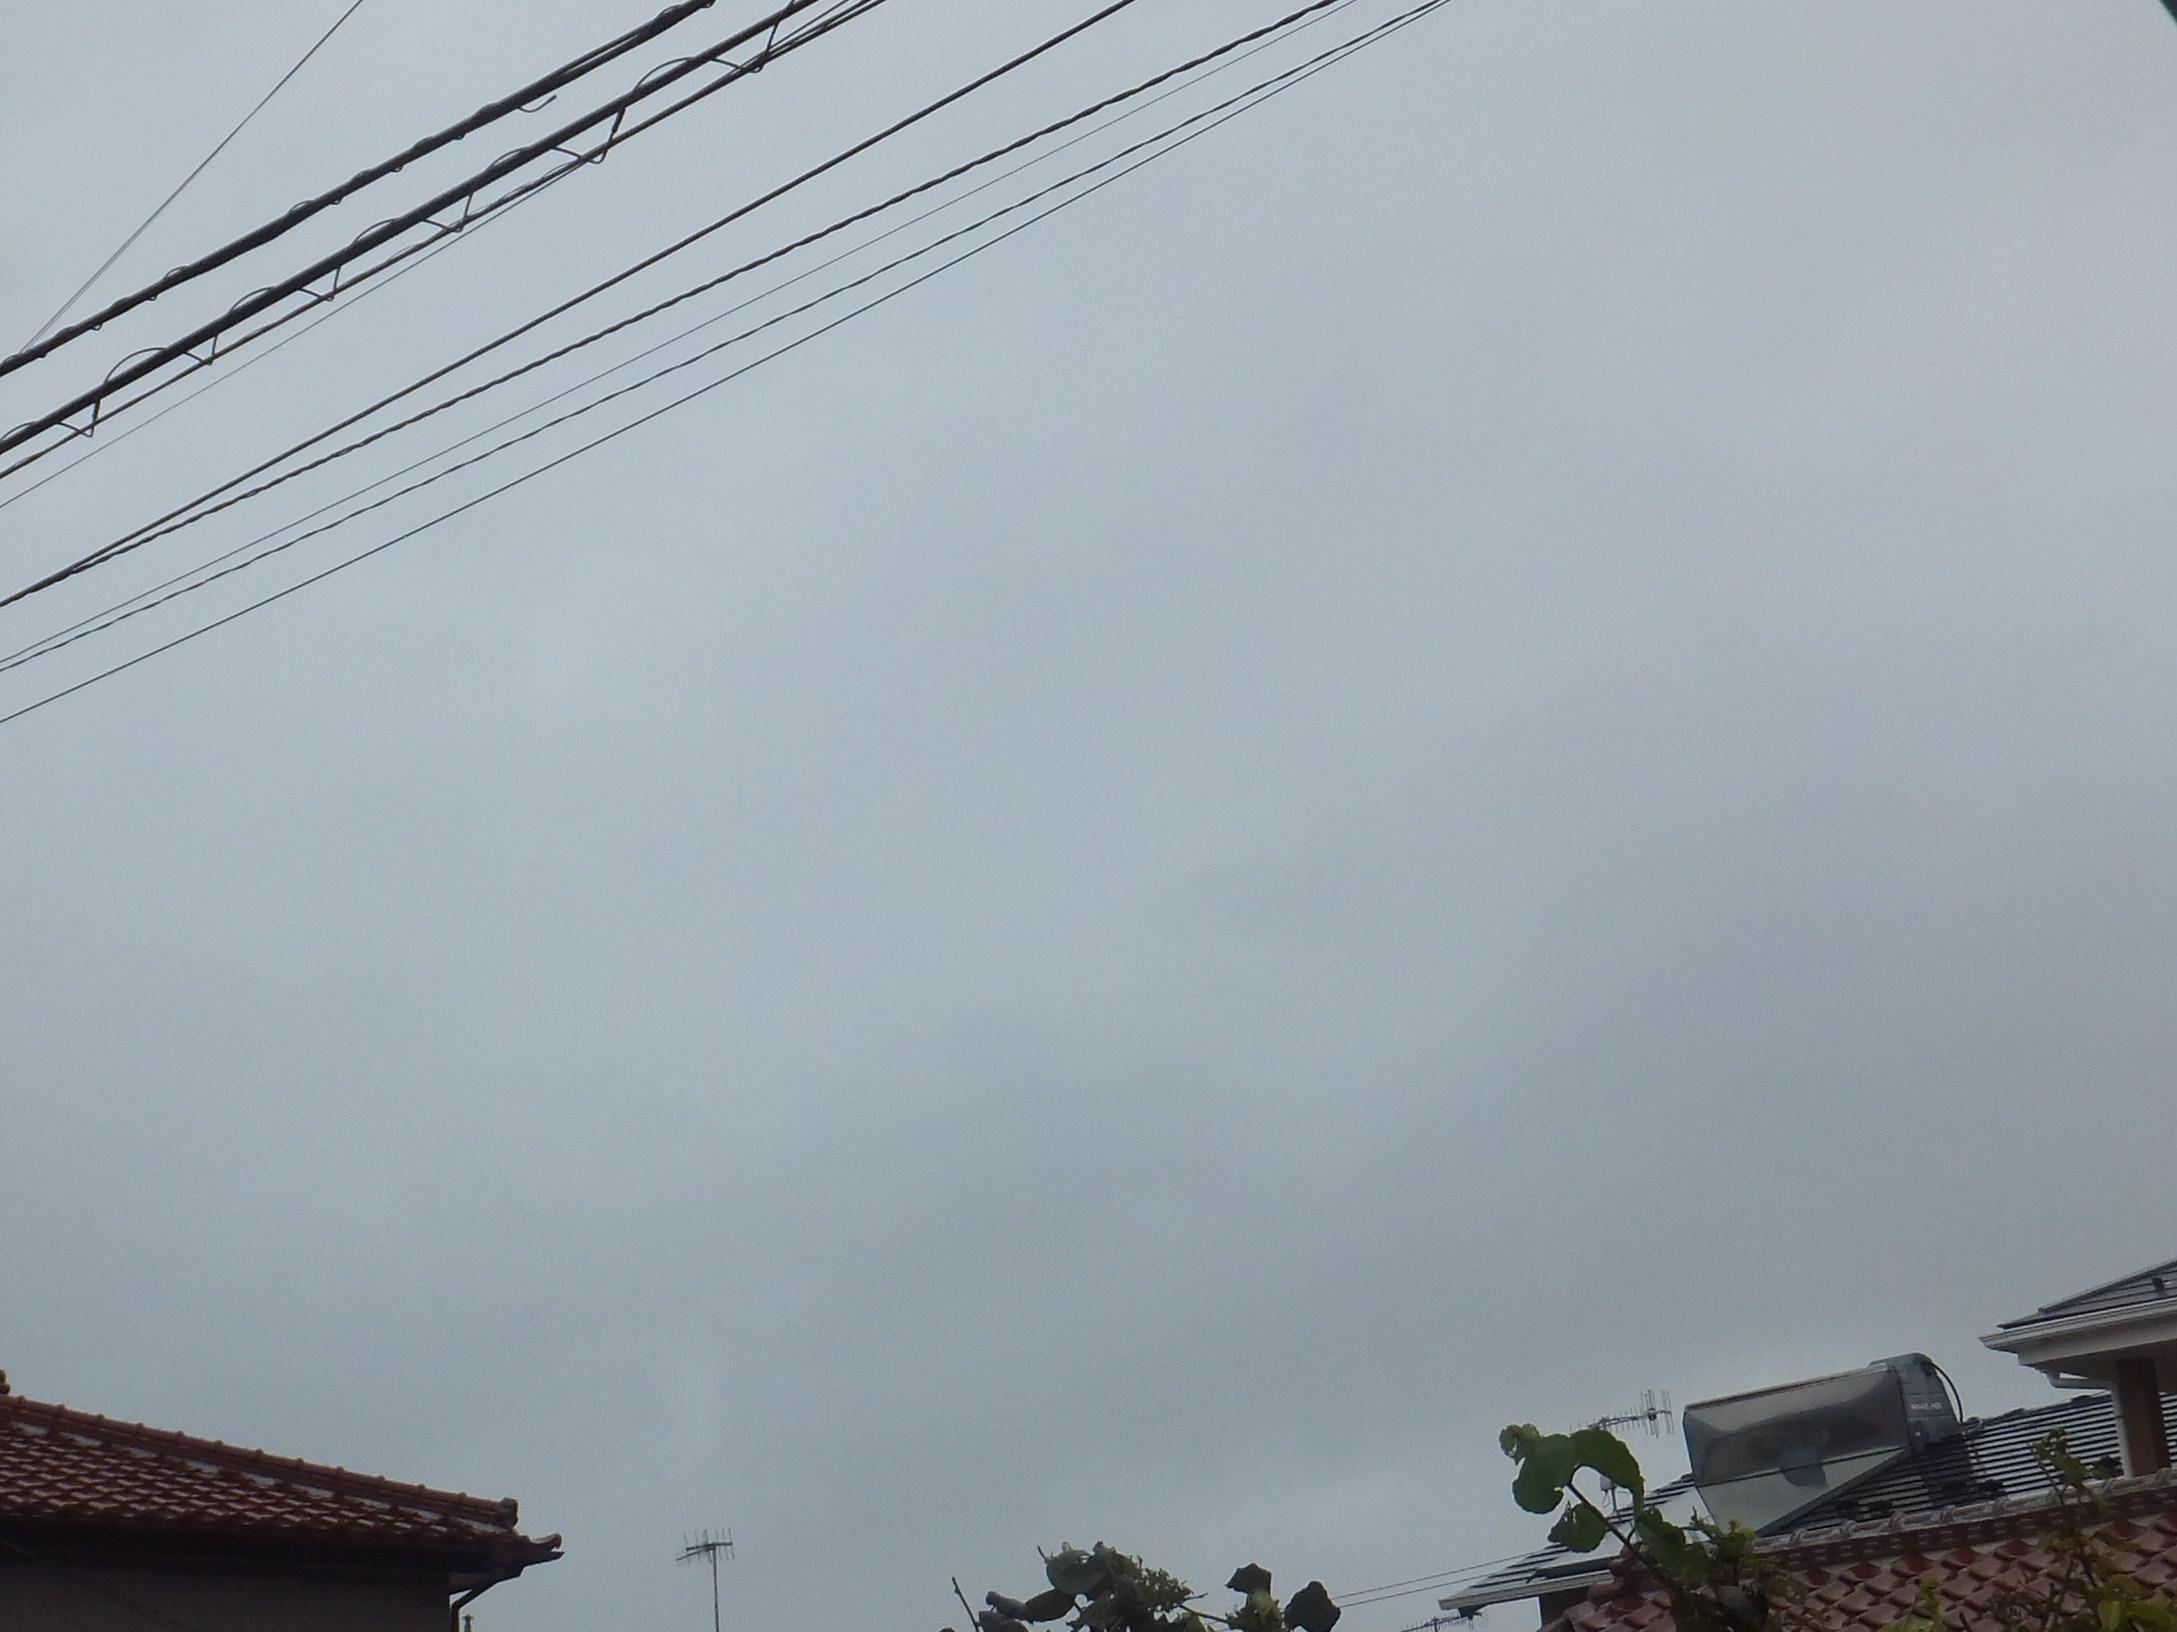 台風襲来....パソコン異常!(gat-user-id.jp)_b0137932_9362985.jpg